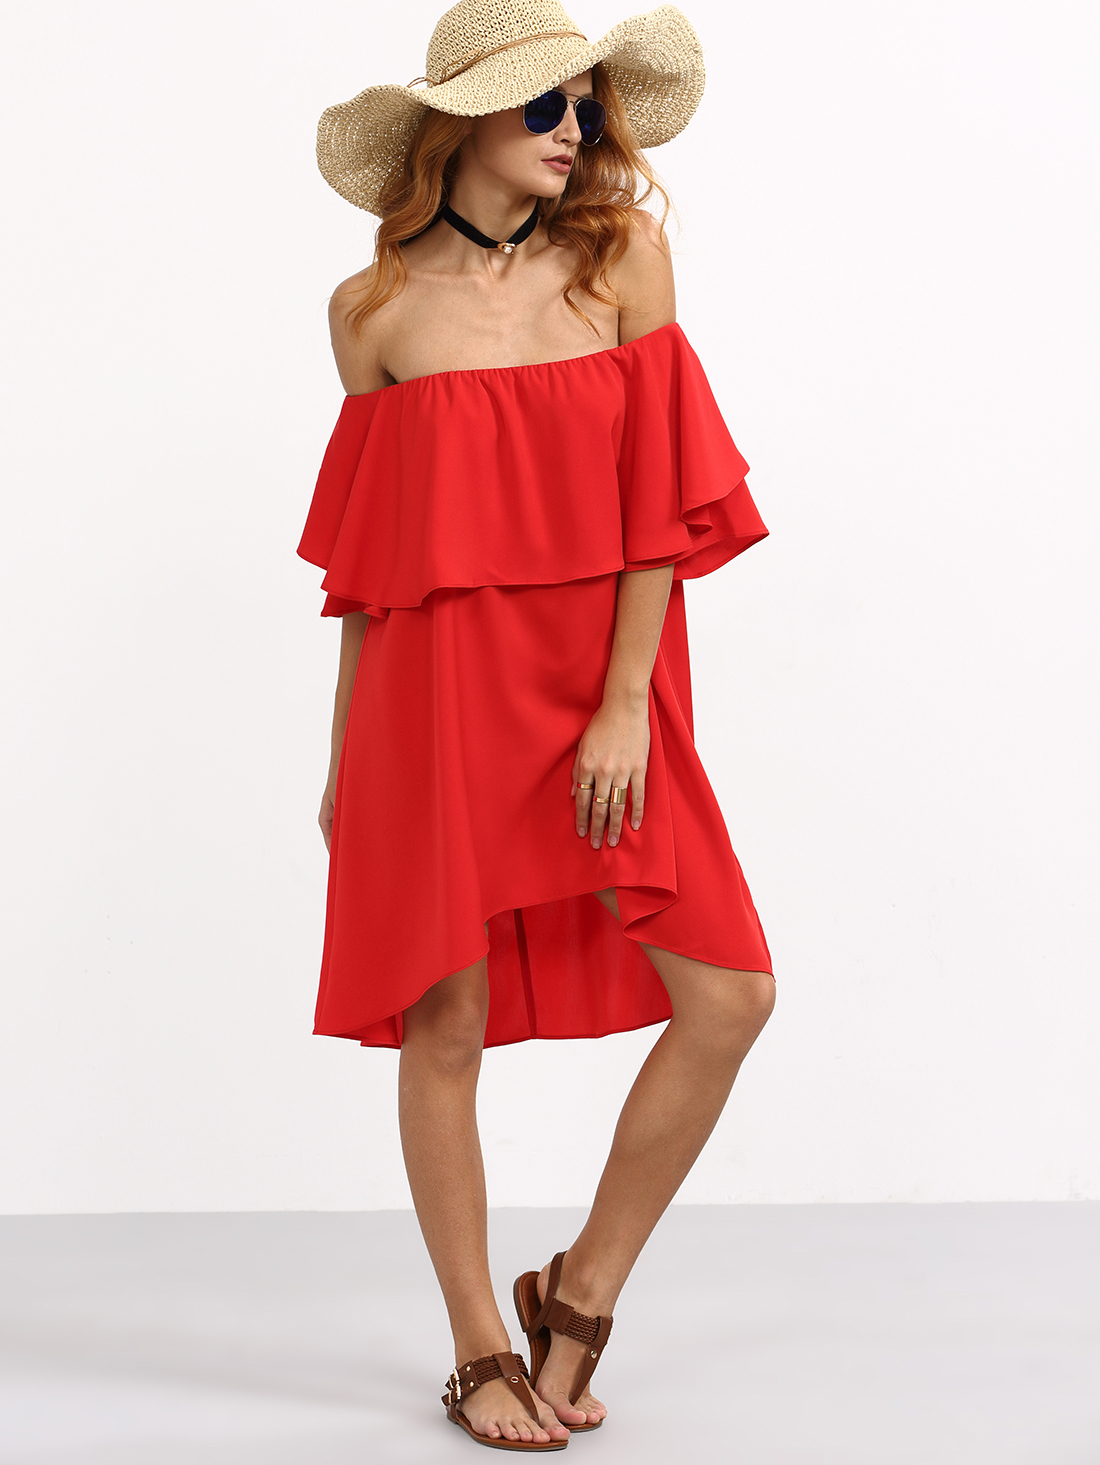 shein off the shoulder red dress